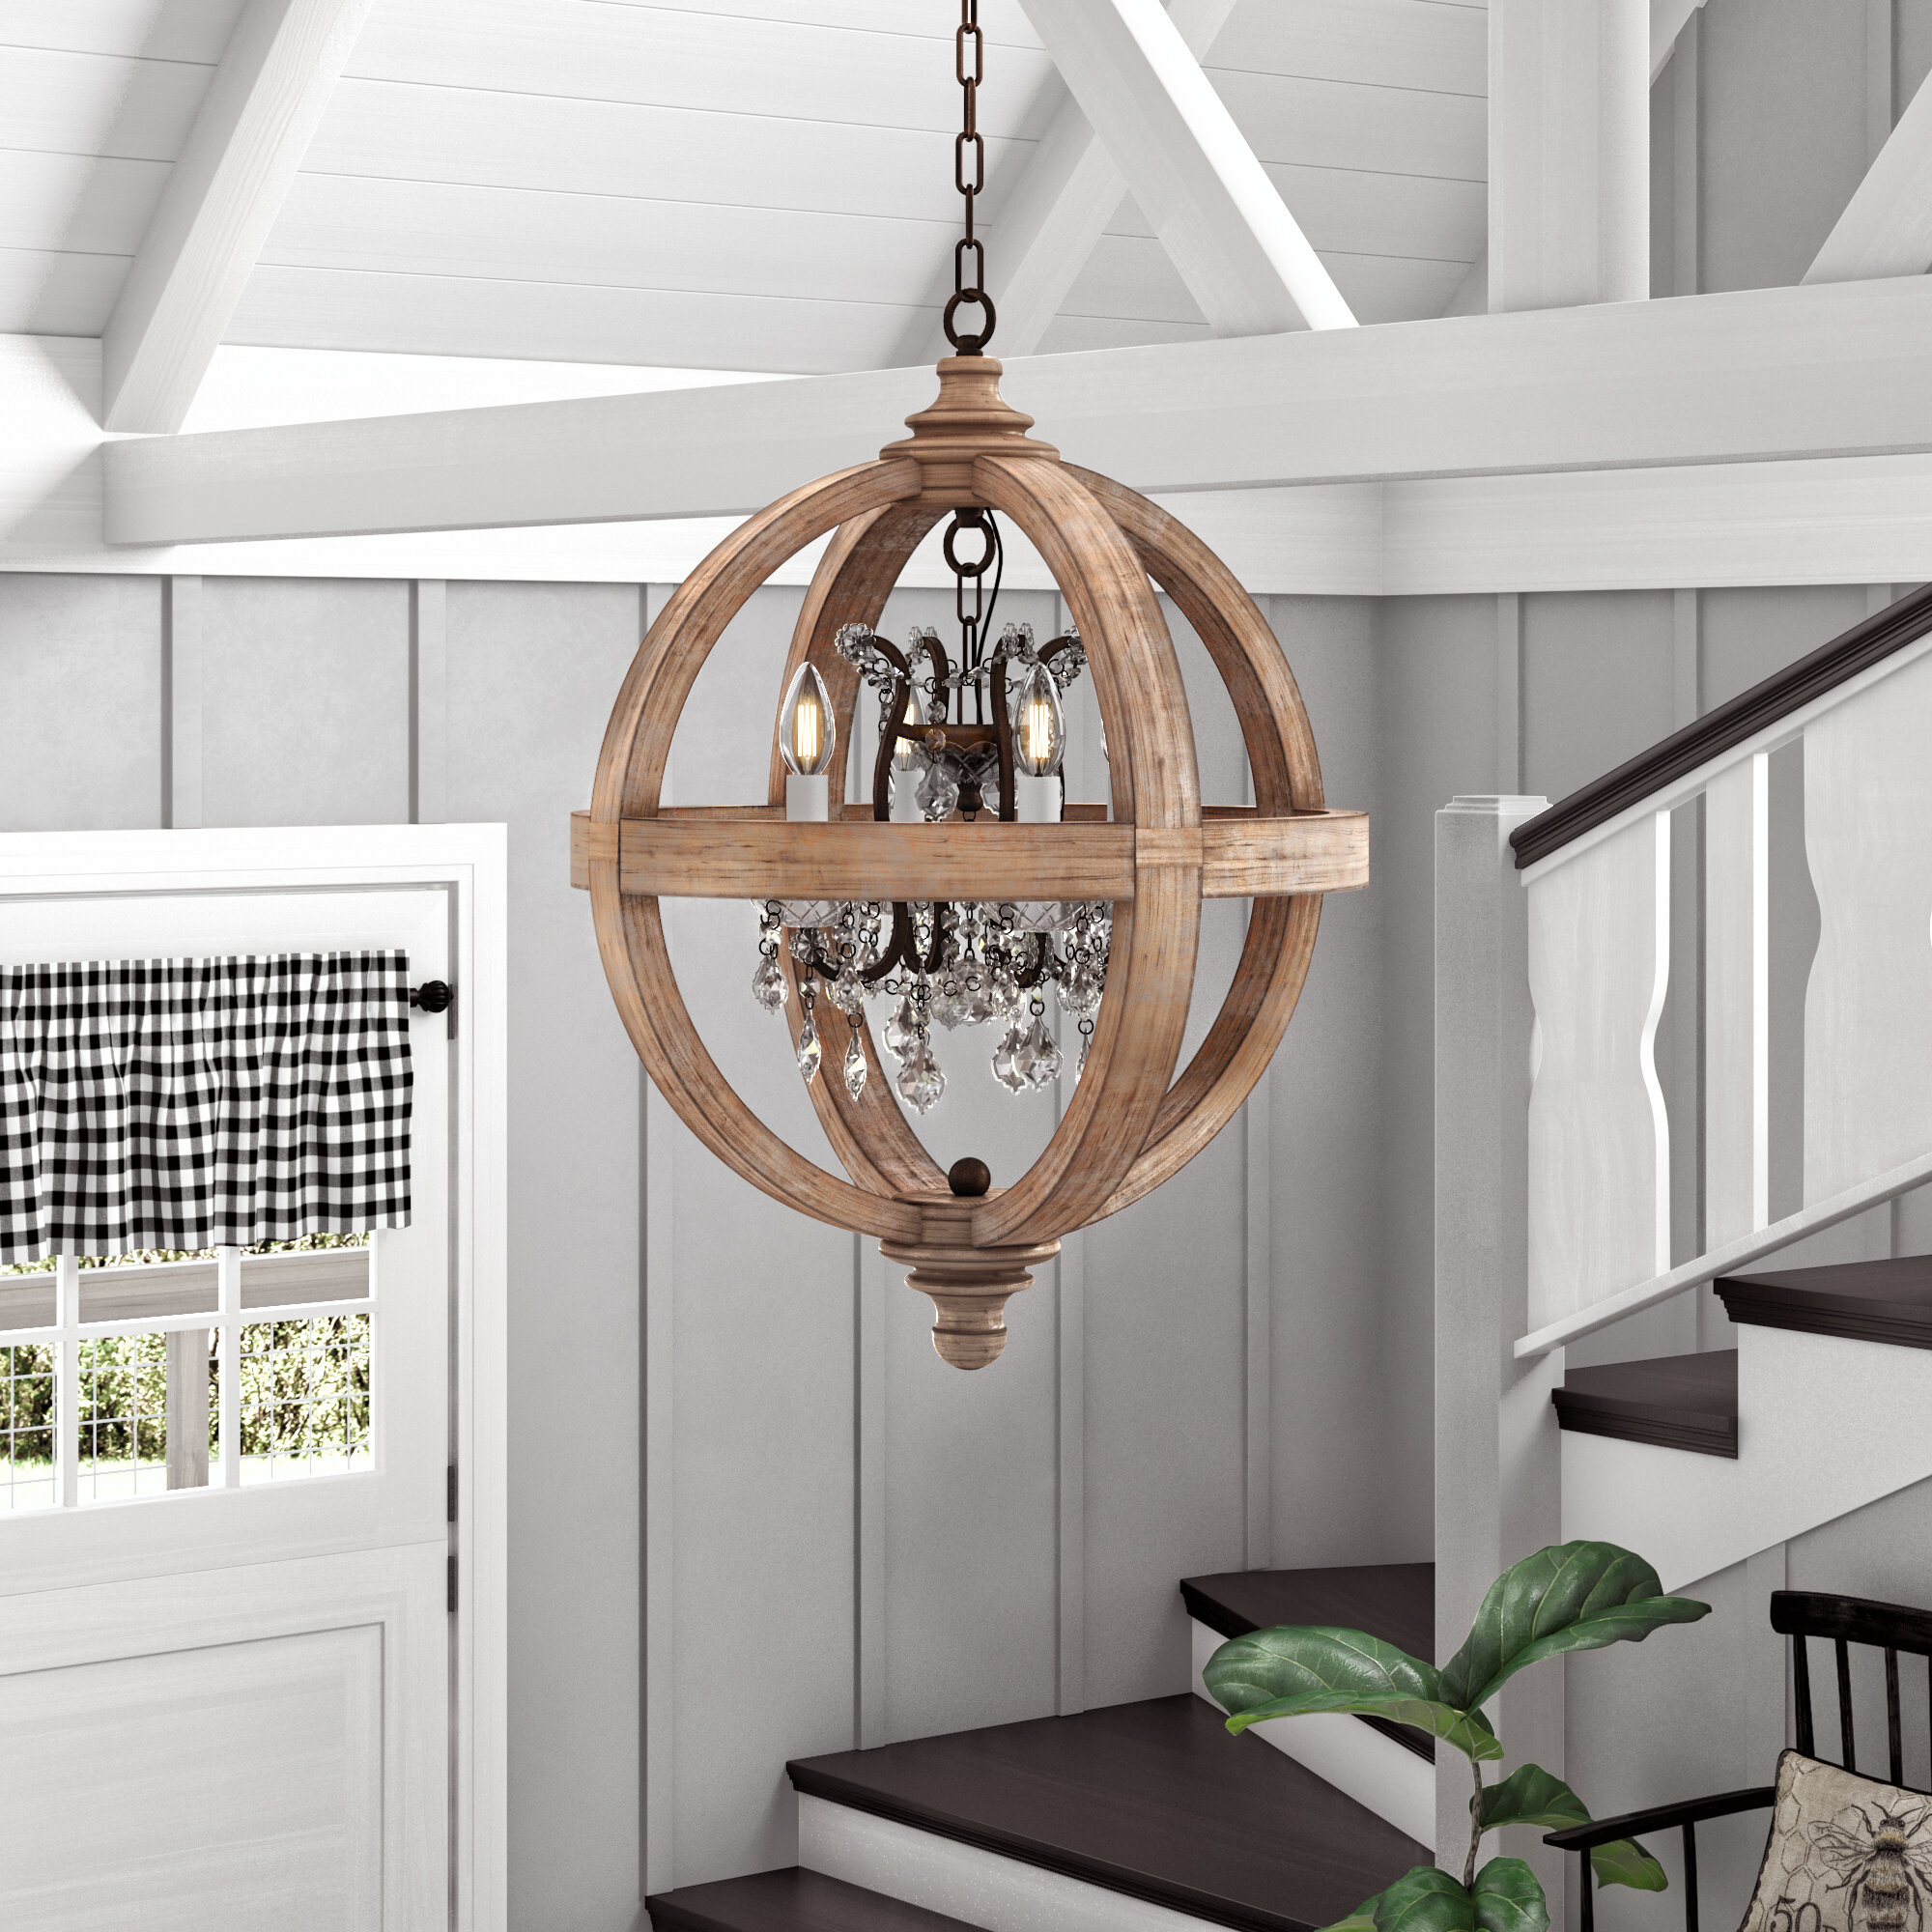 Montecito 4 Light Globe Chandelier For Filipe Globe Chandeliers (View 23 of 30)